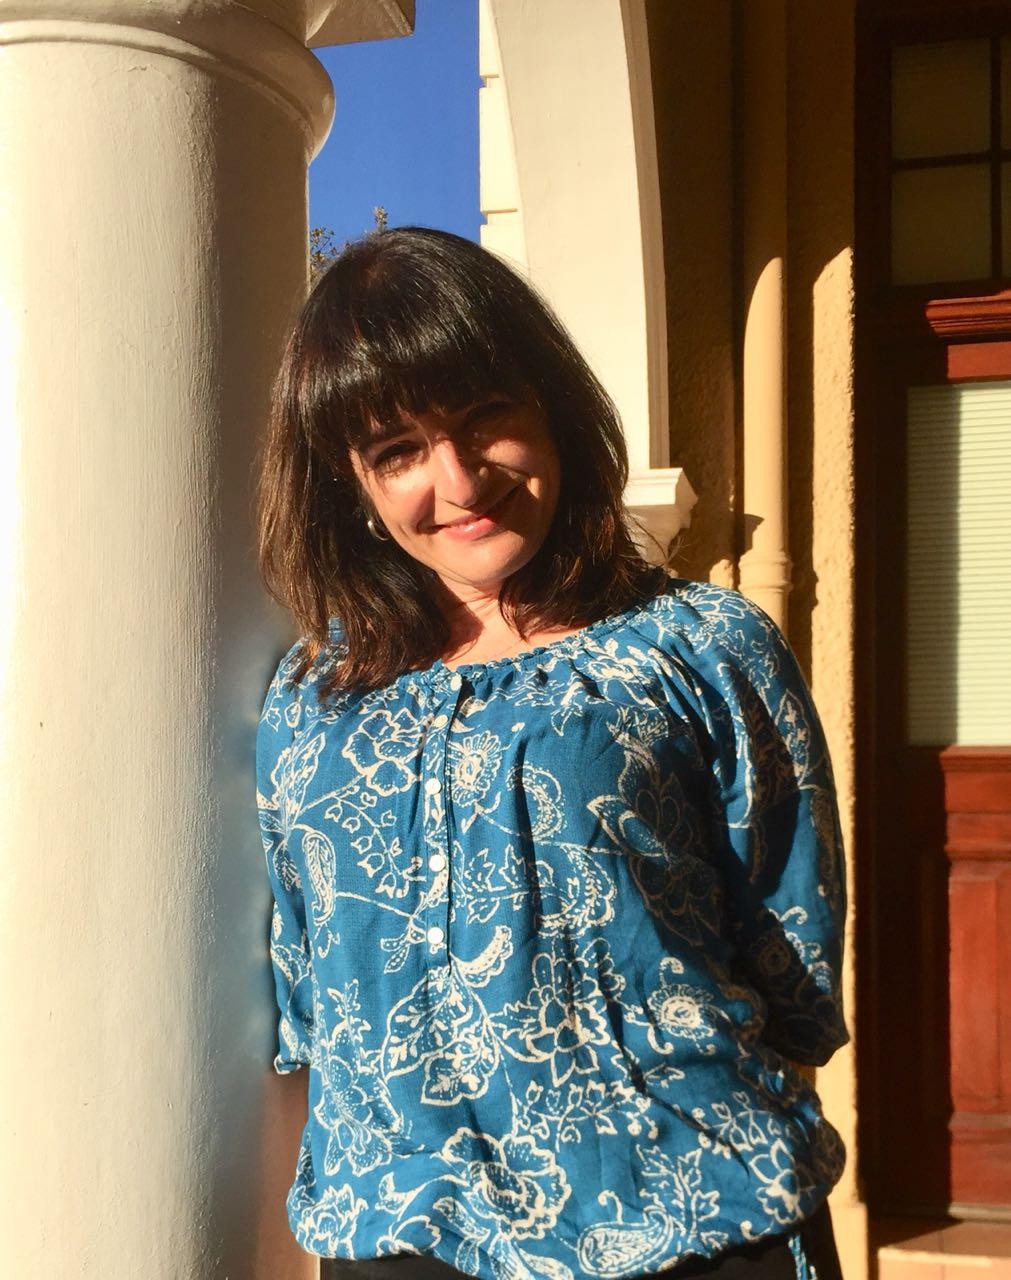 Joanna Marzec-Visagie – TWK municipality